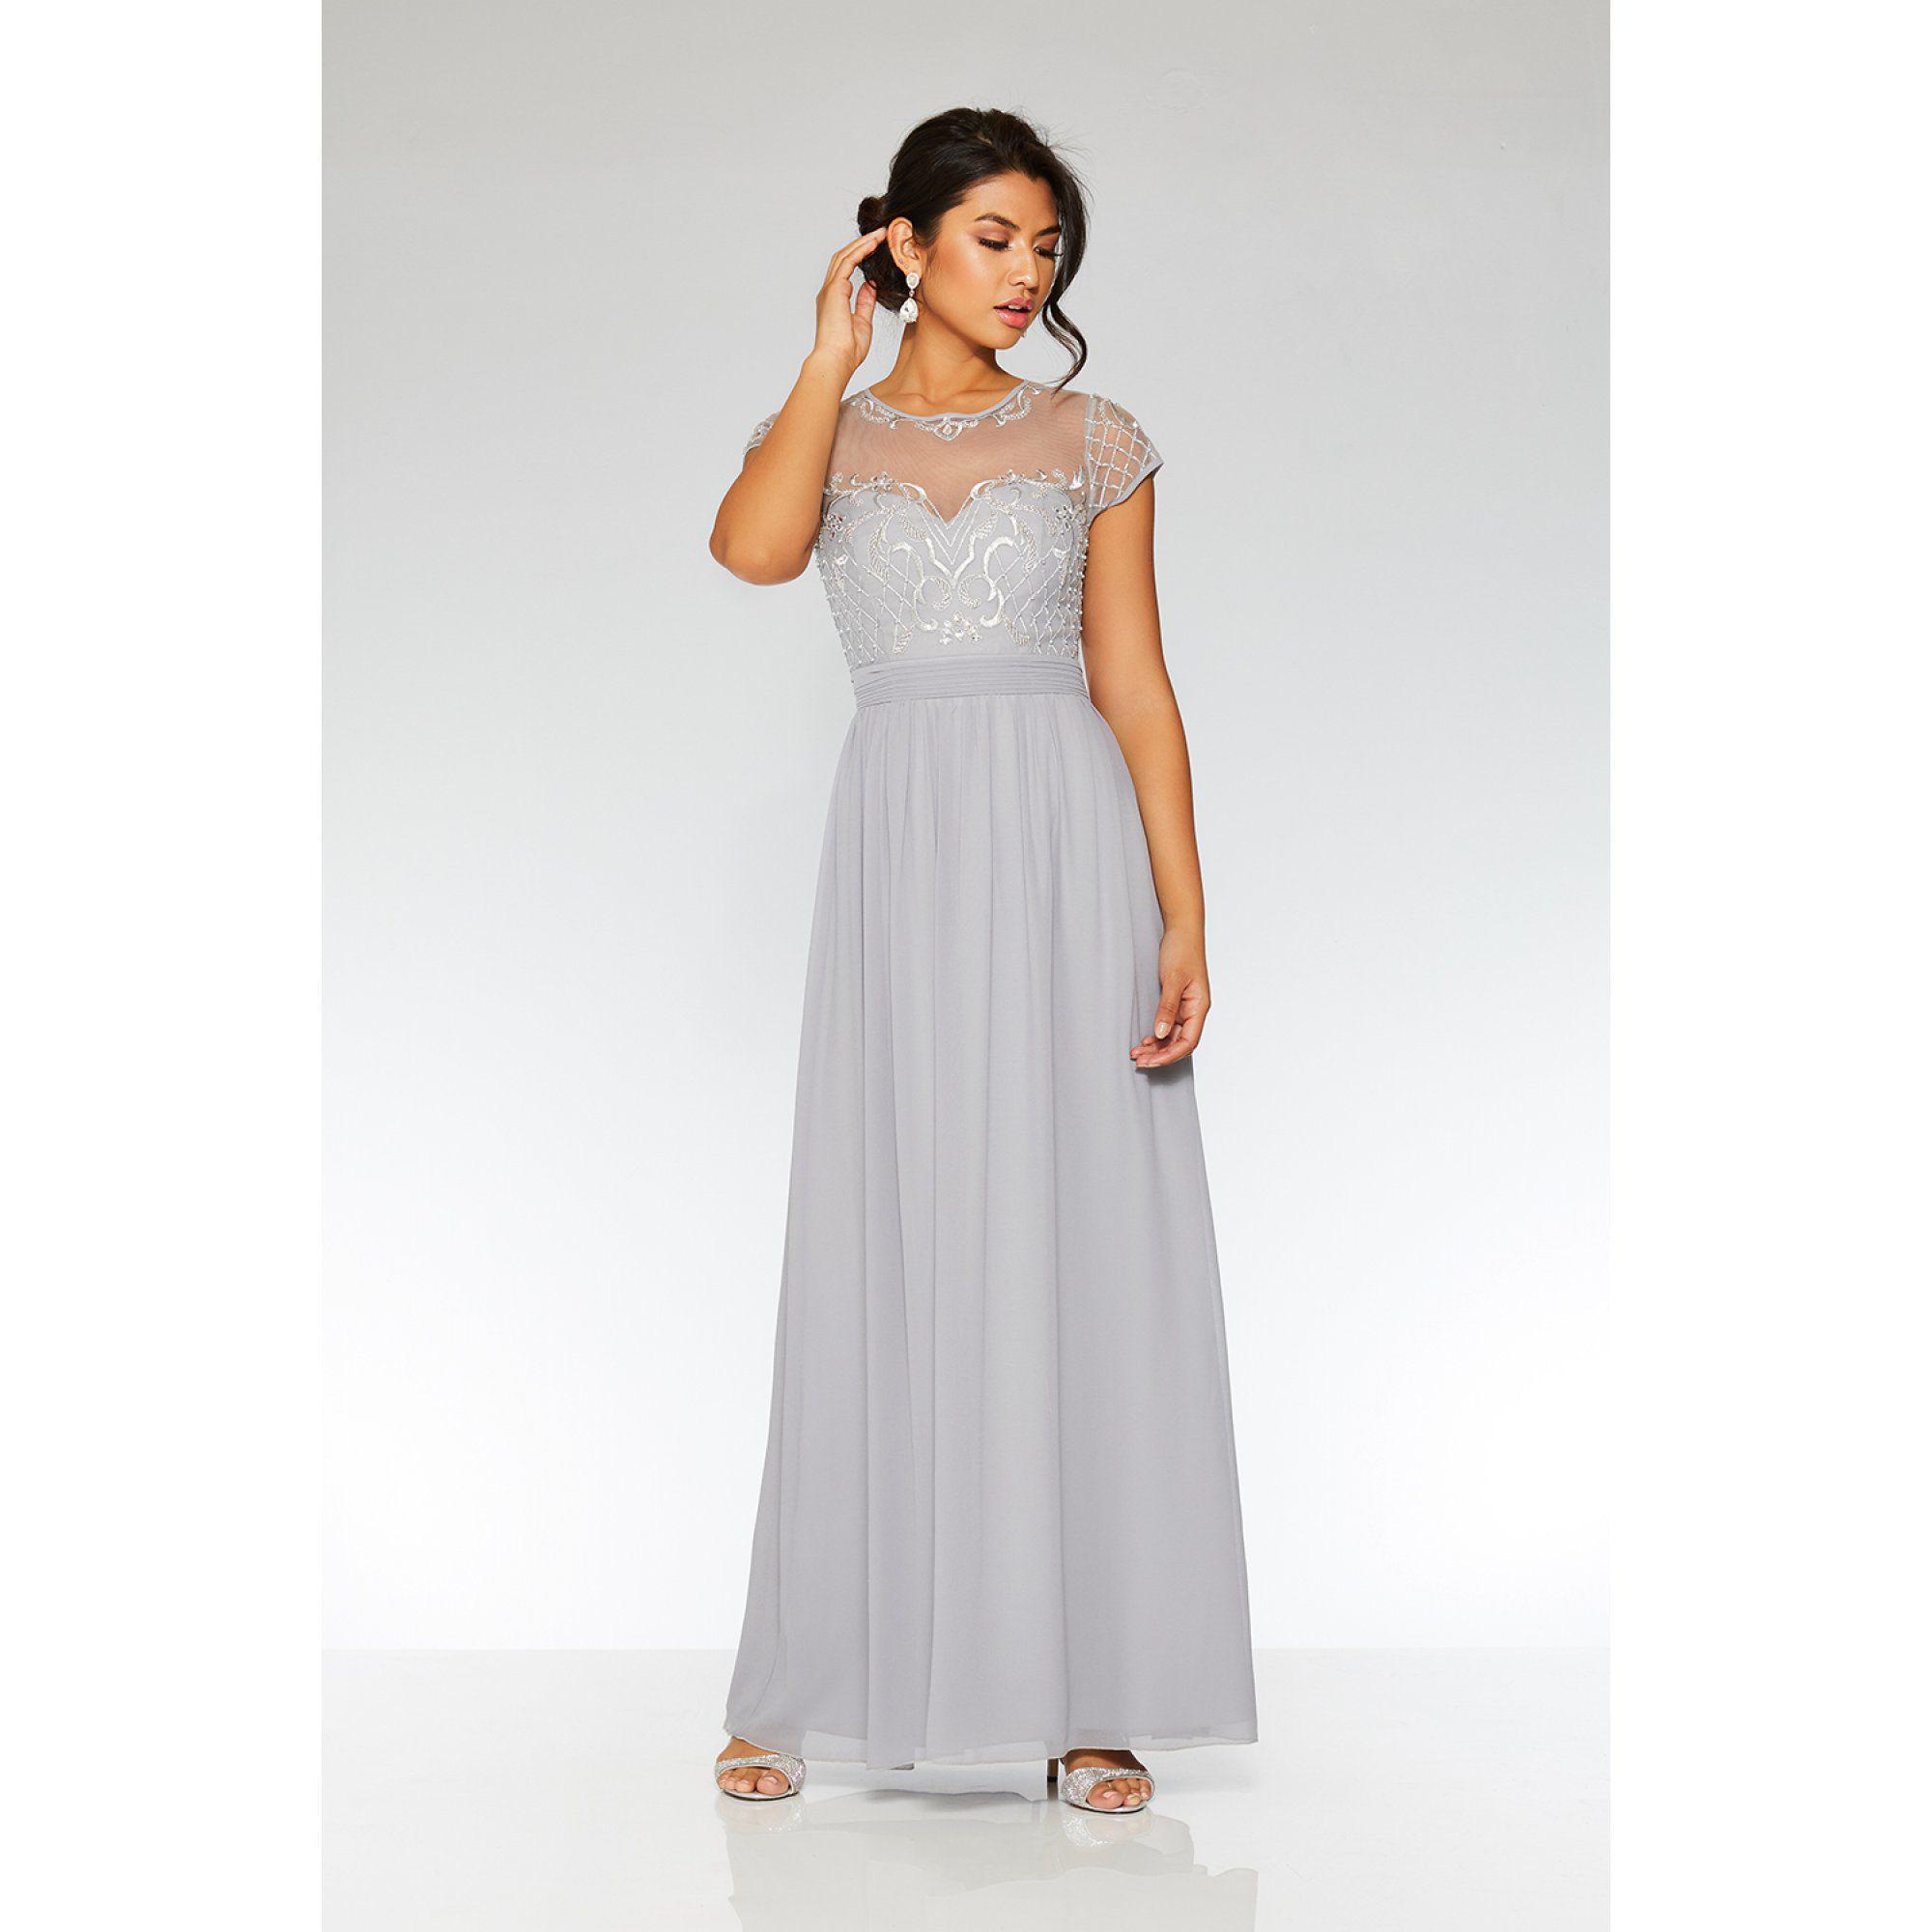 d0a3adaded97 ... Quiz - Gray Grey Chiffon Cap Sleeve Maxi Dress - Lyst. Visit Debenhams.  Tap to visit site